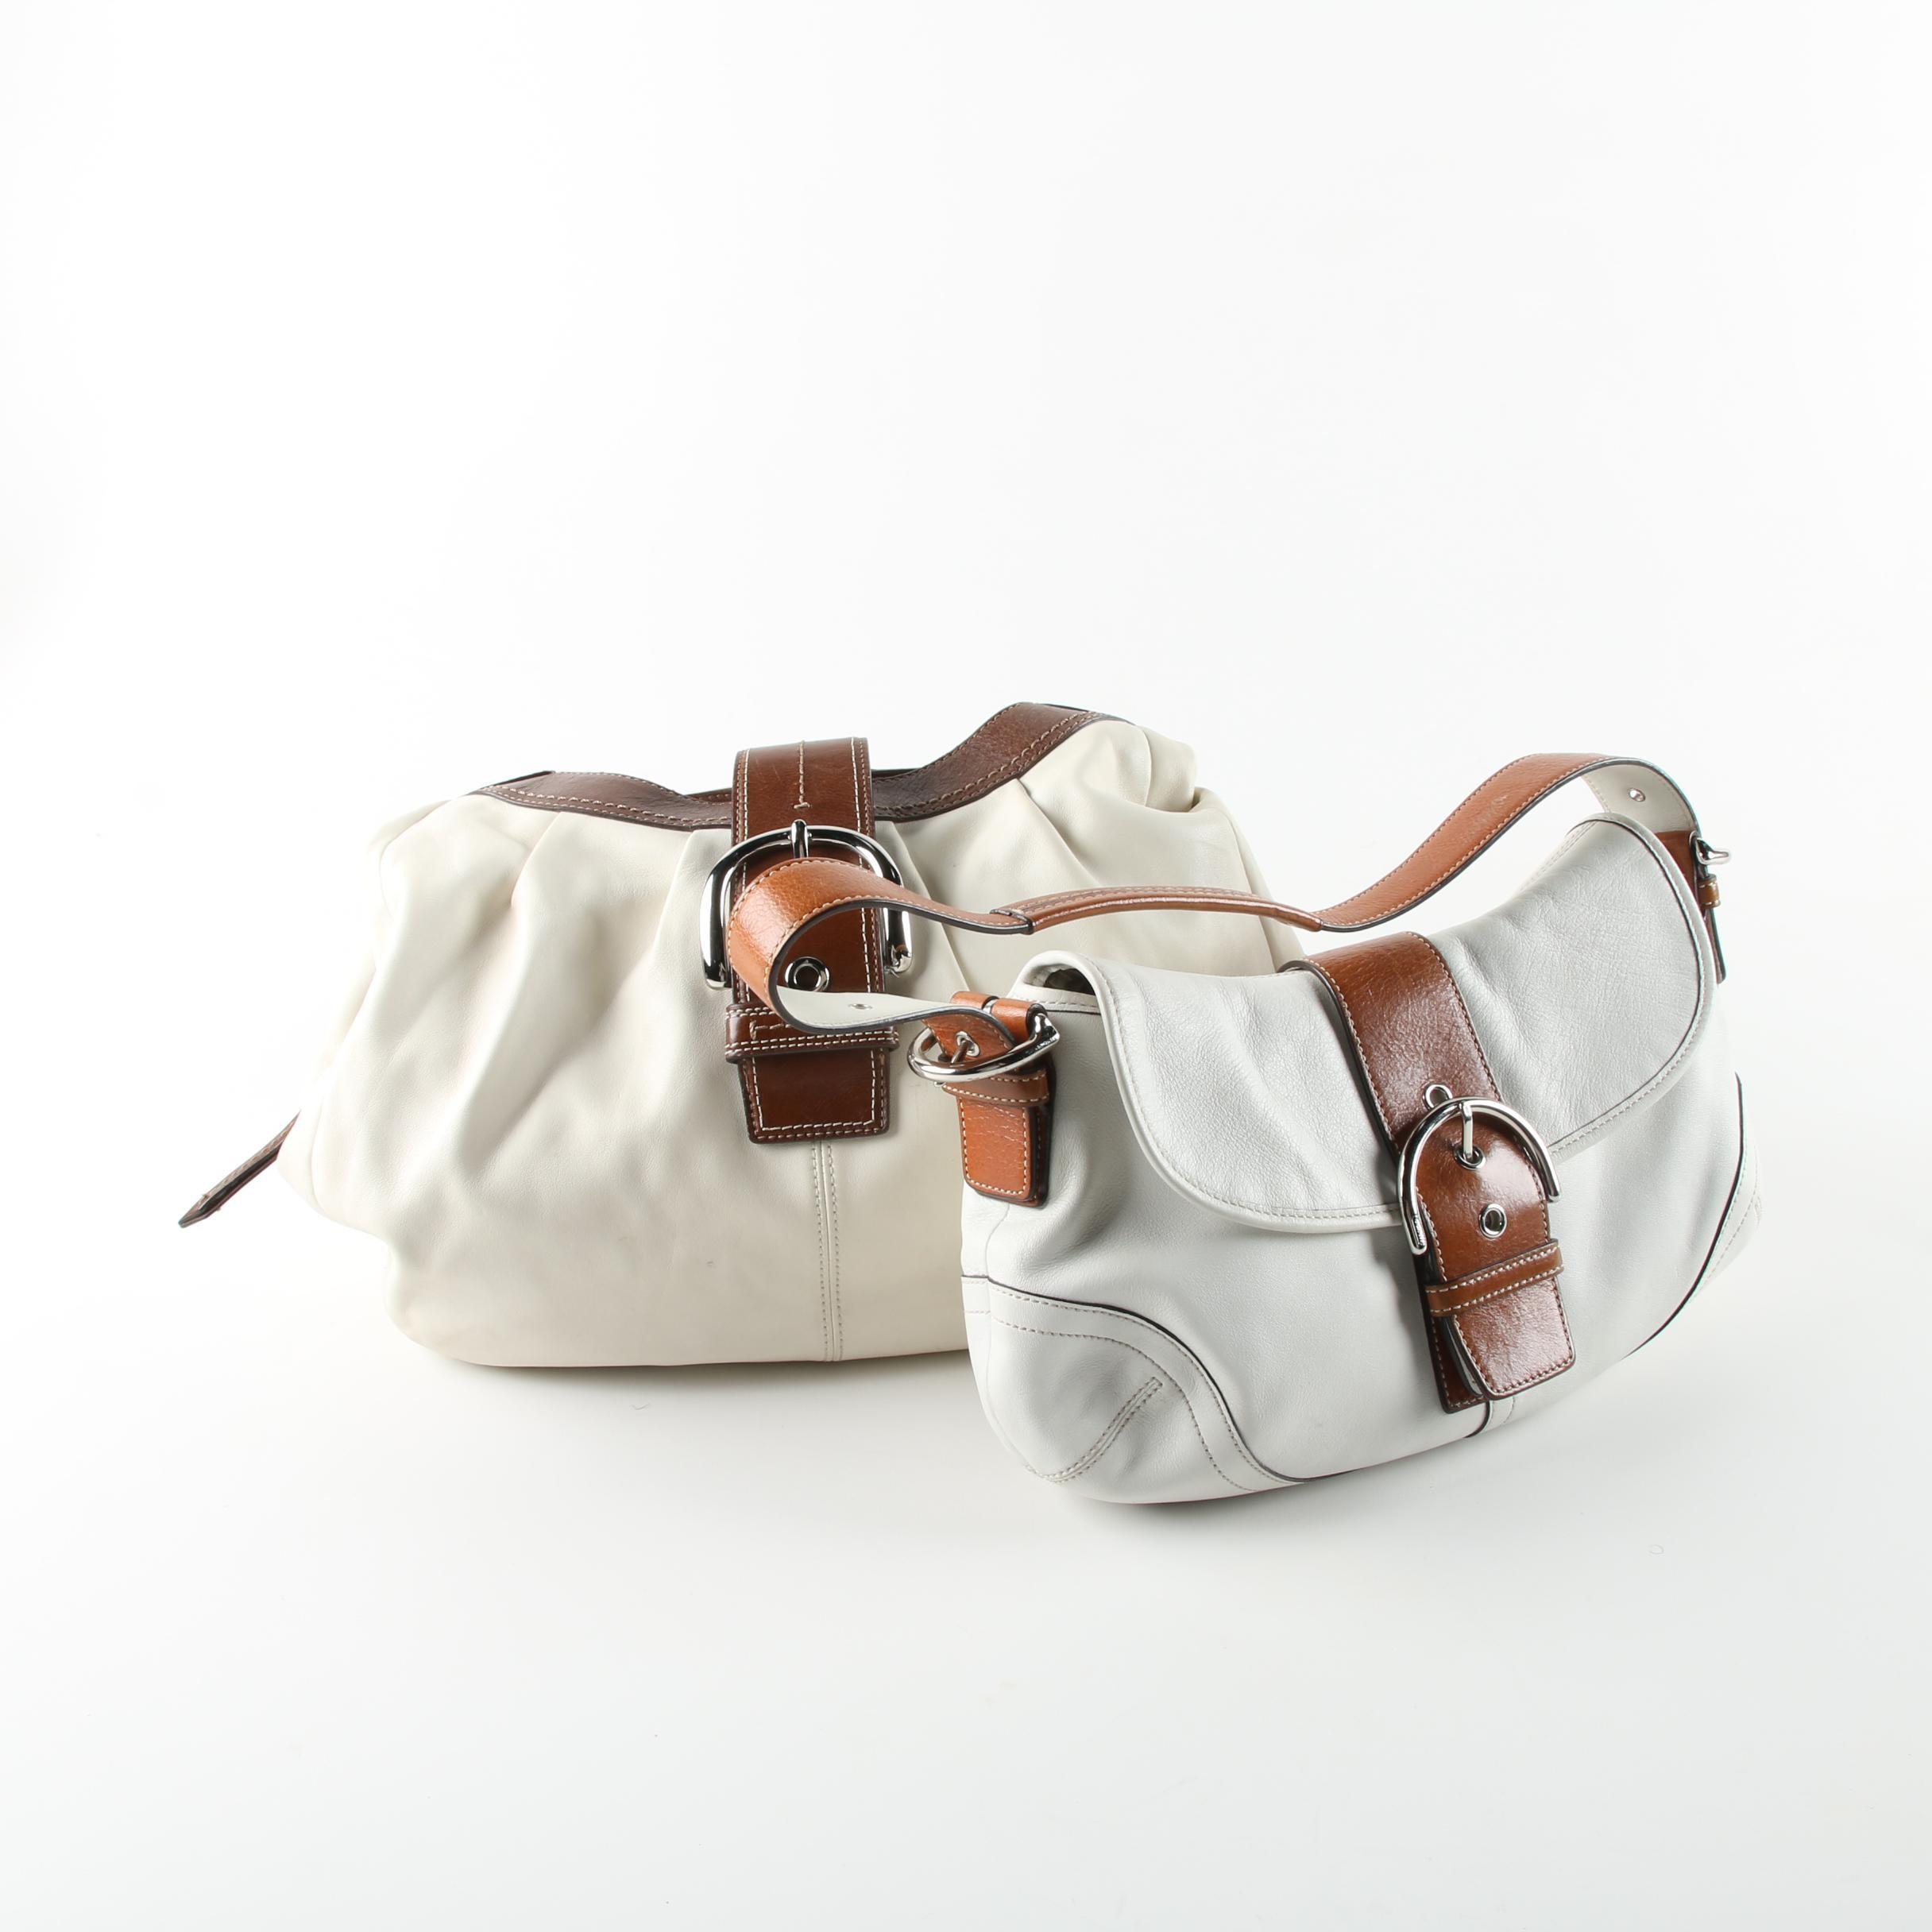 Coach Soho White Leather Baguette and Soho Cream Leather Hobo Bag